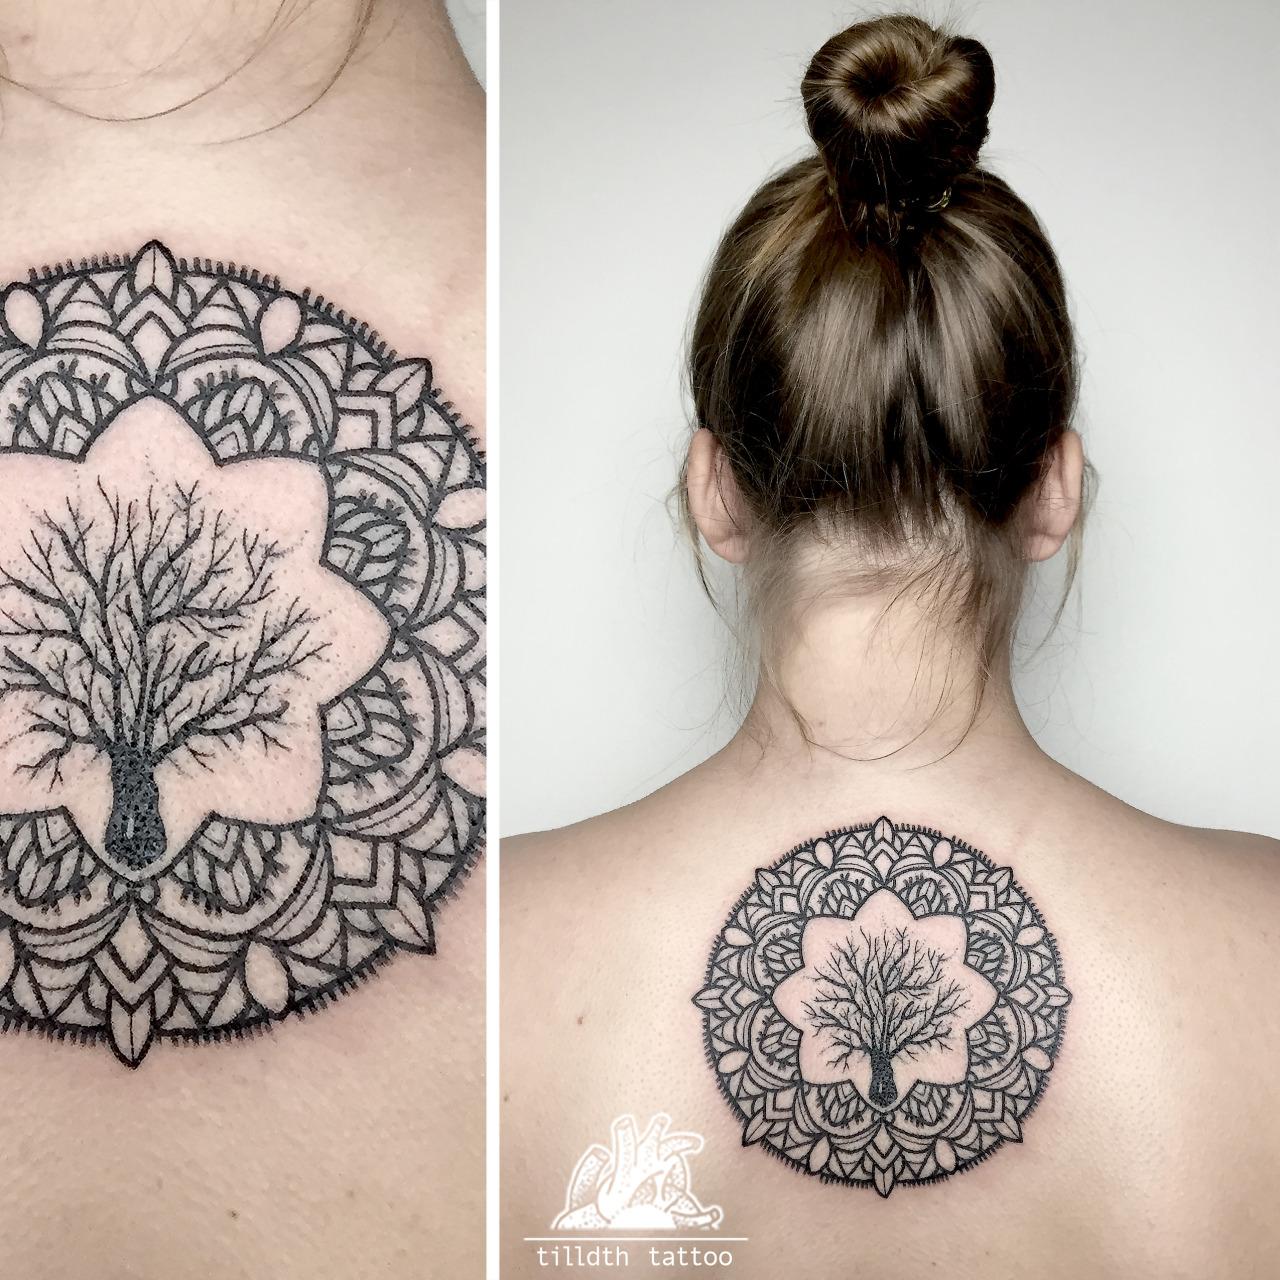 Tilldth Tattoo - the vandallist (8)